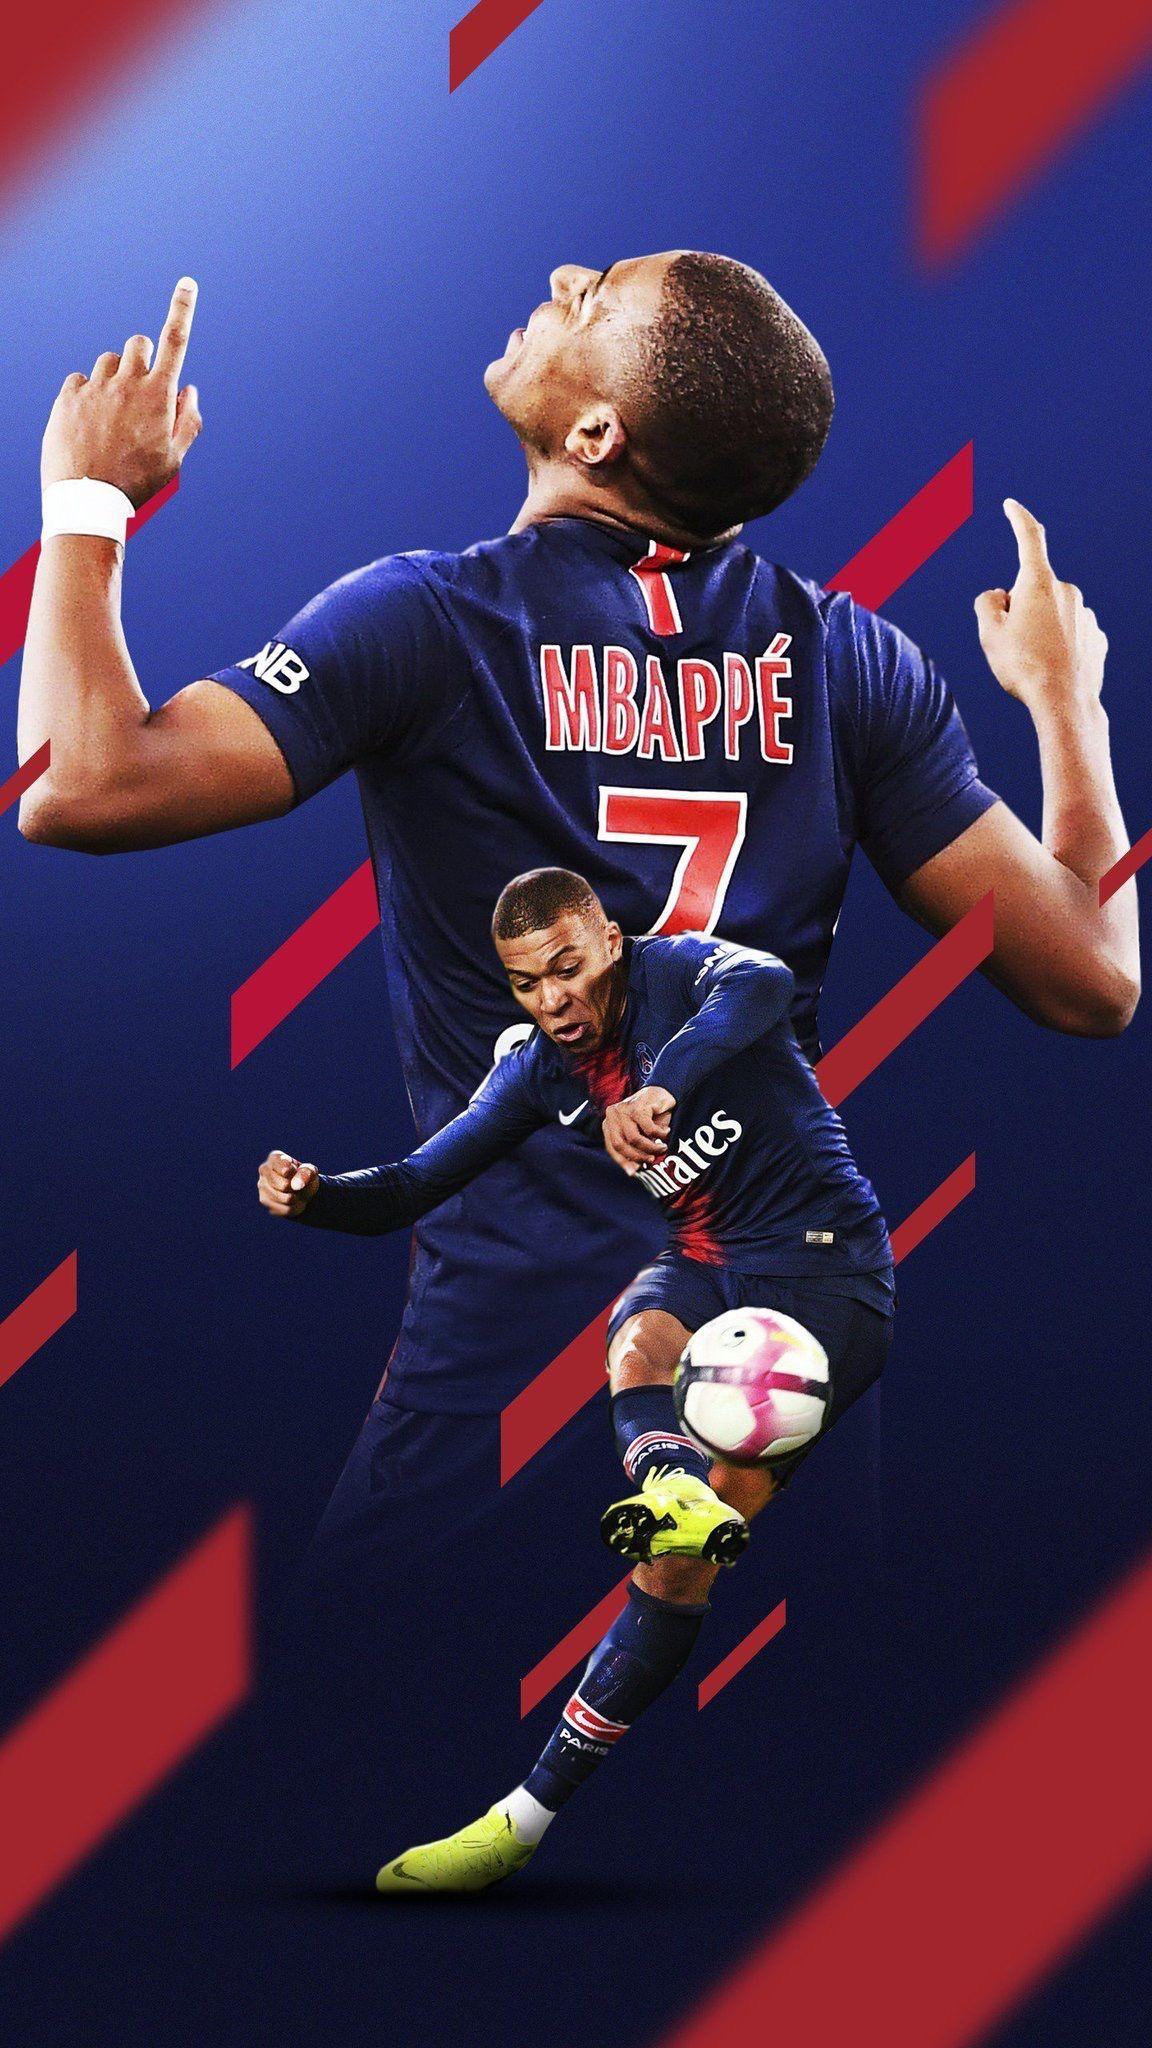 mbappe mbappe psg psg 2019 2020